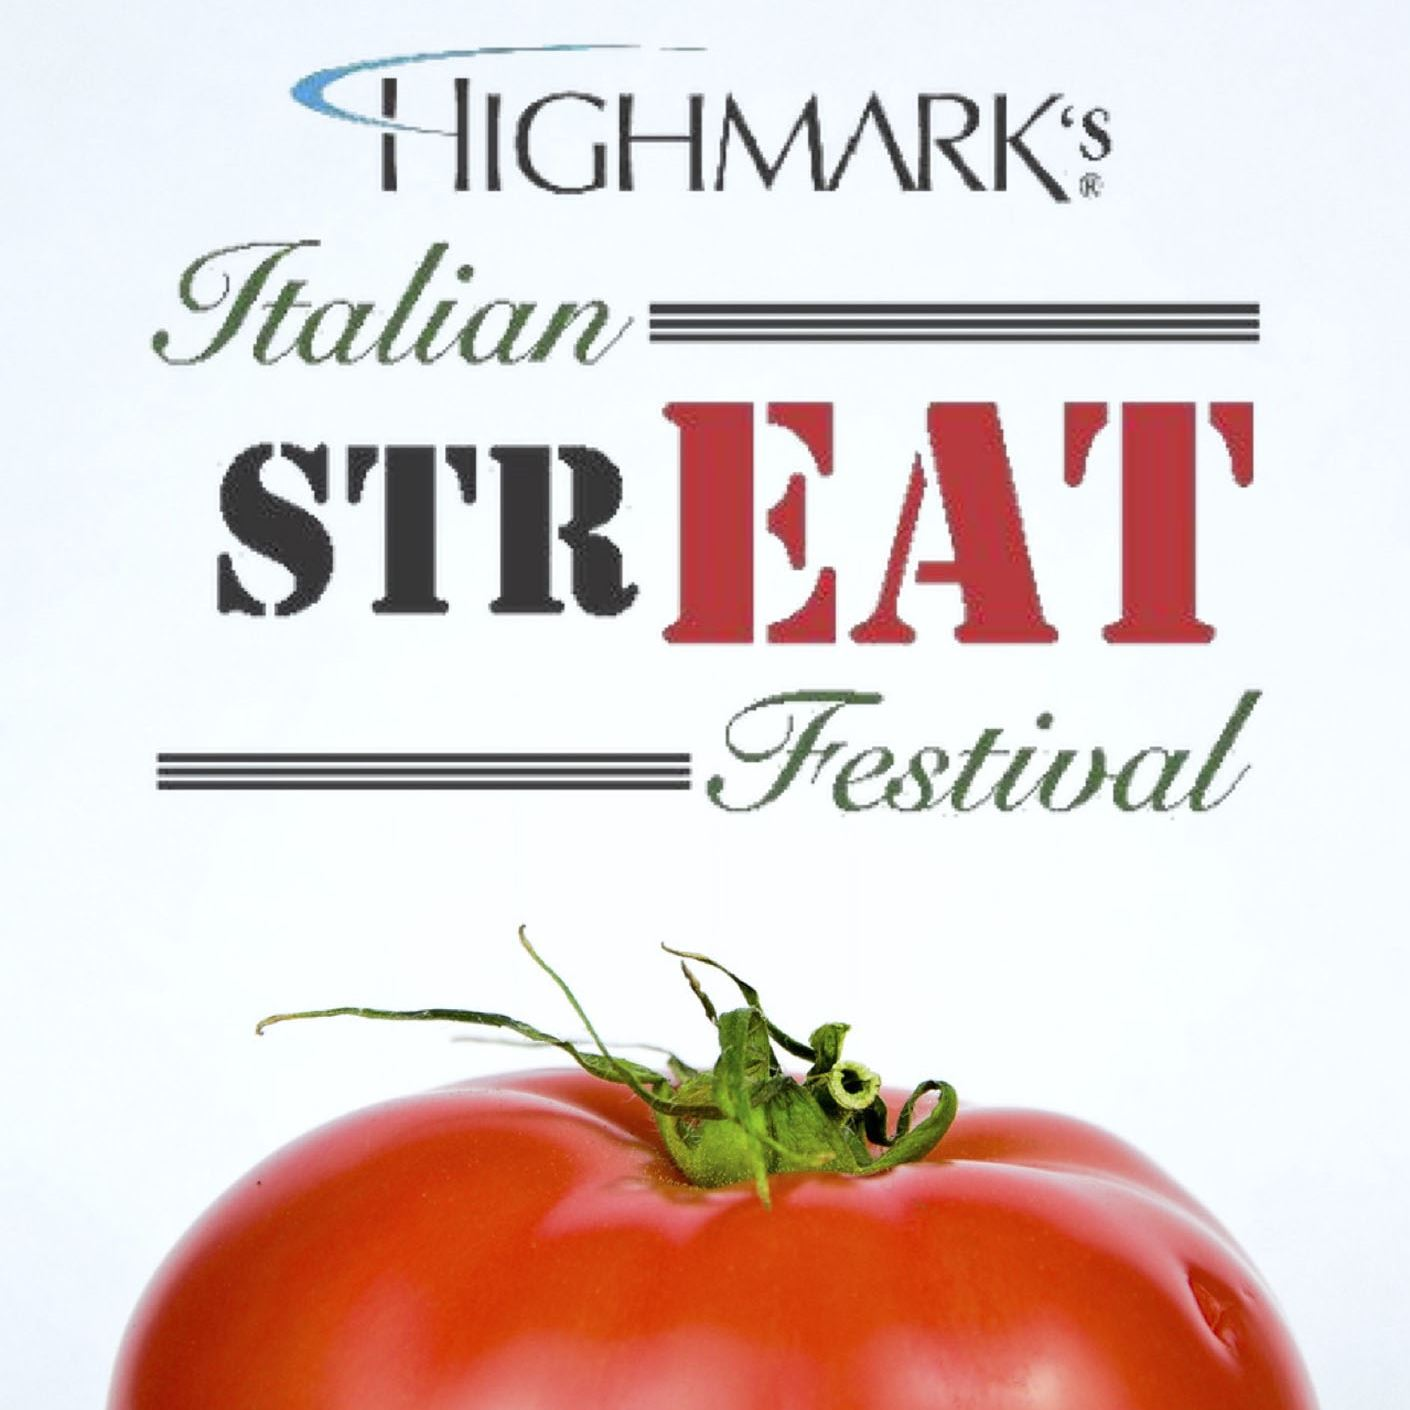 logo_streat_festival Italian strEAT Festival logo.